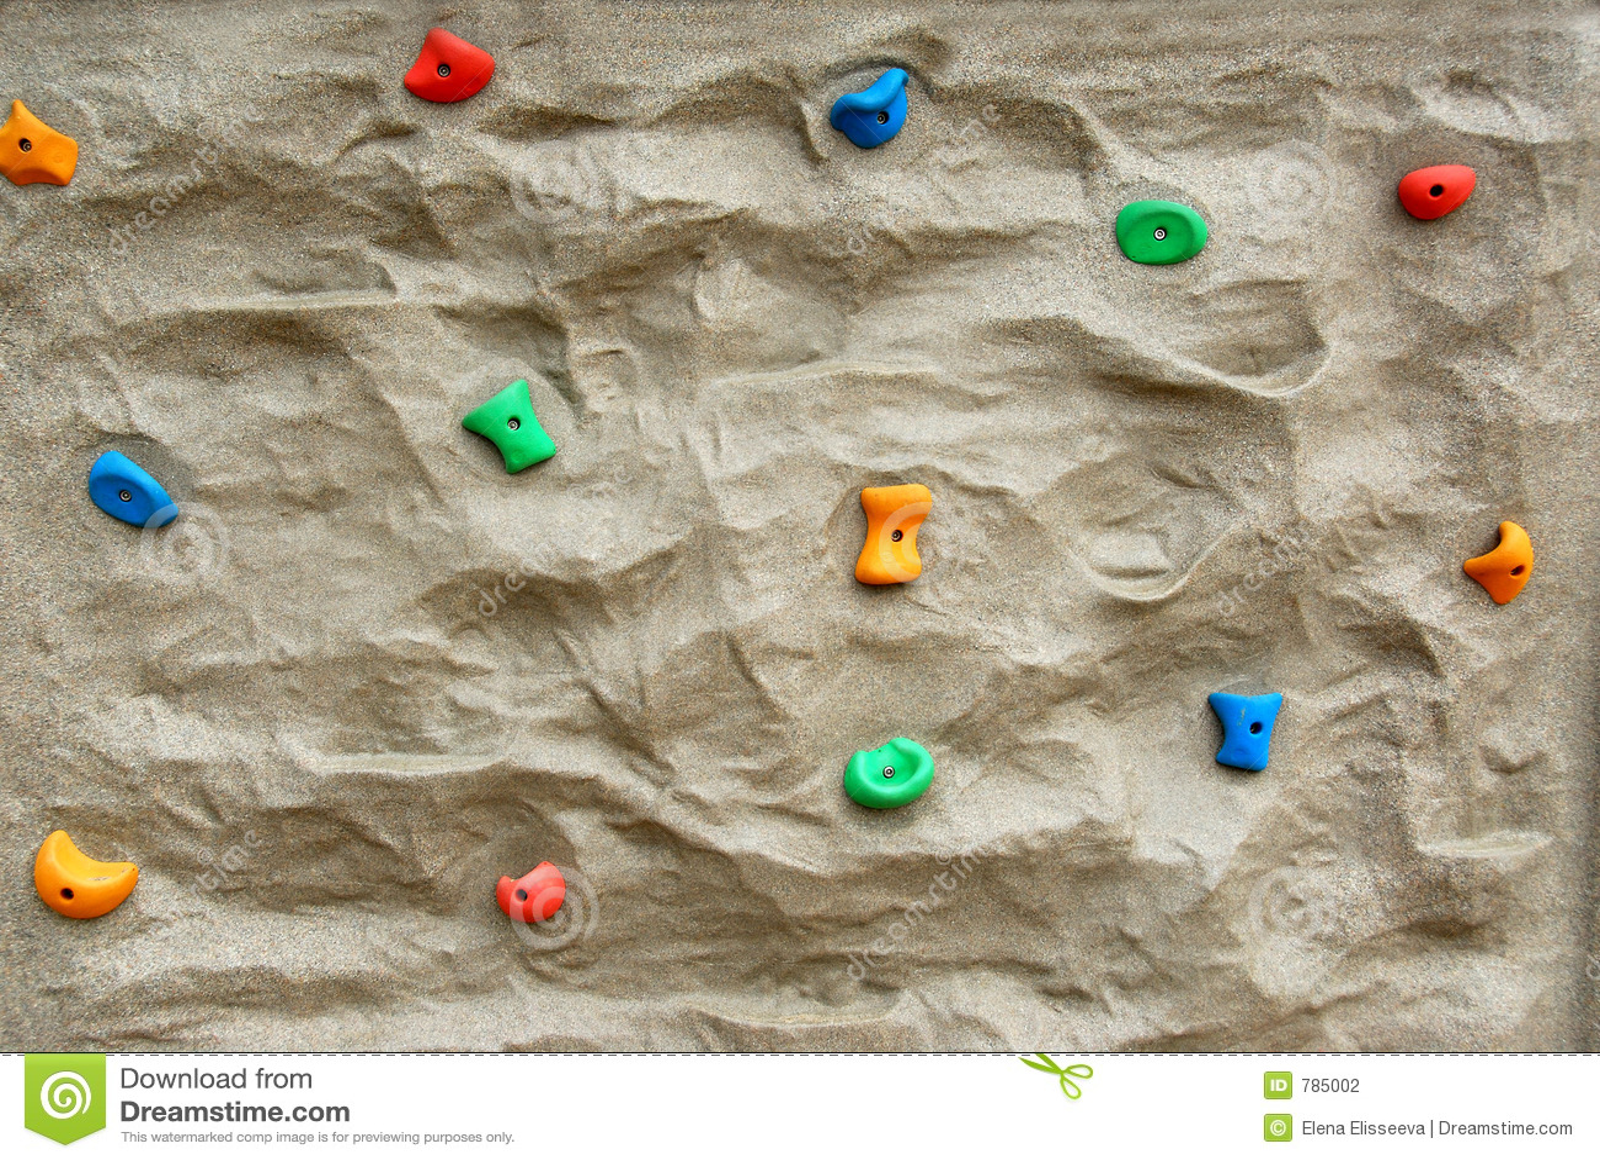 Rock climbing wall stock photo. Image of exercise ...